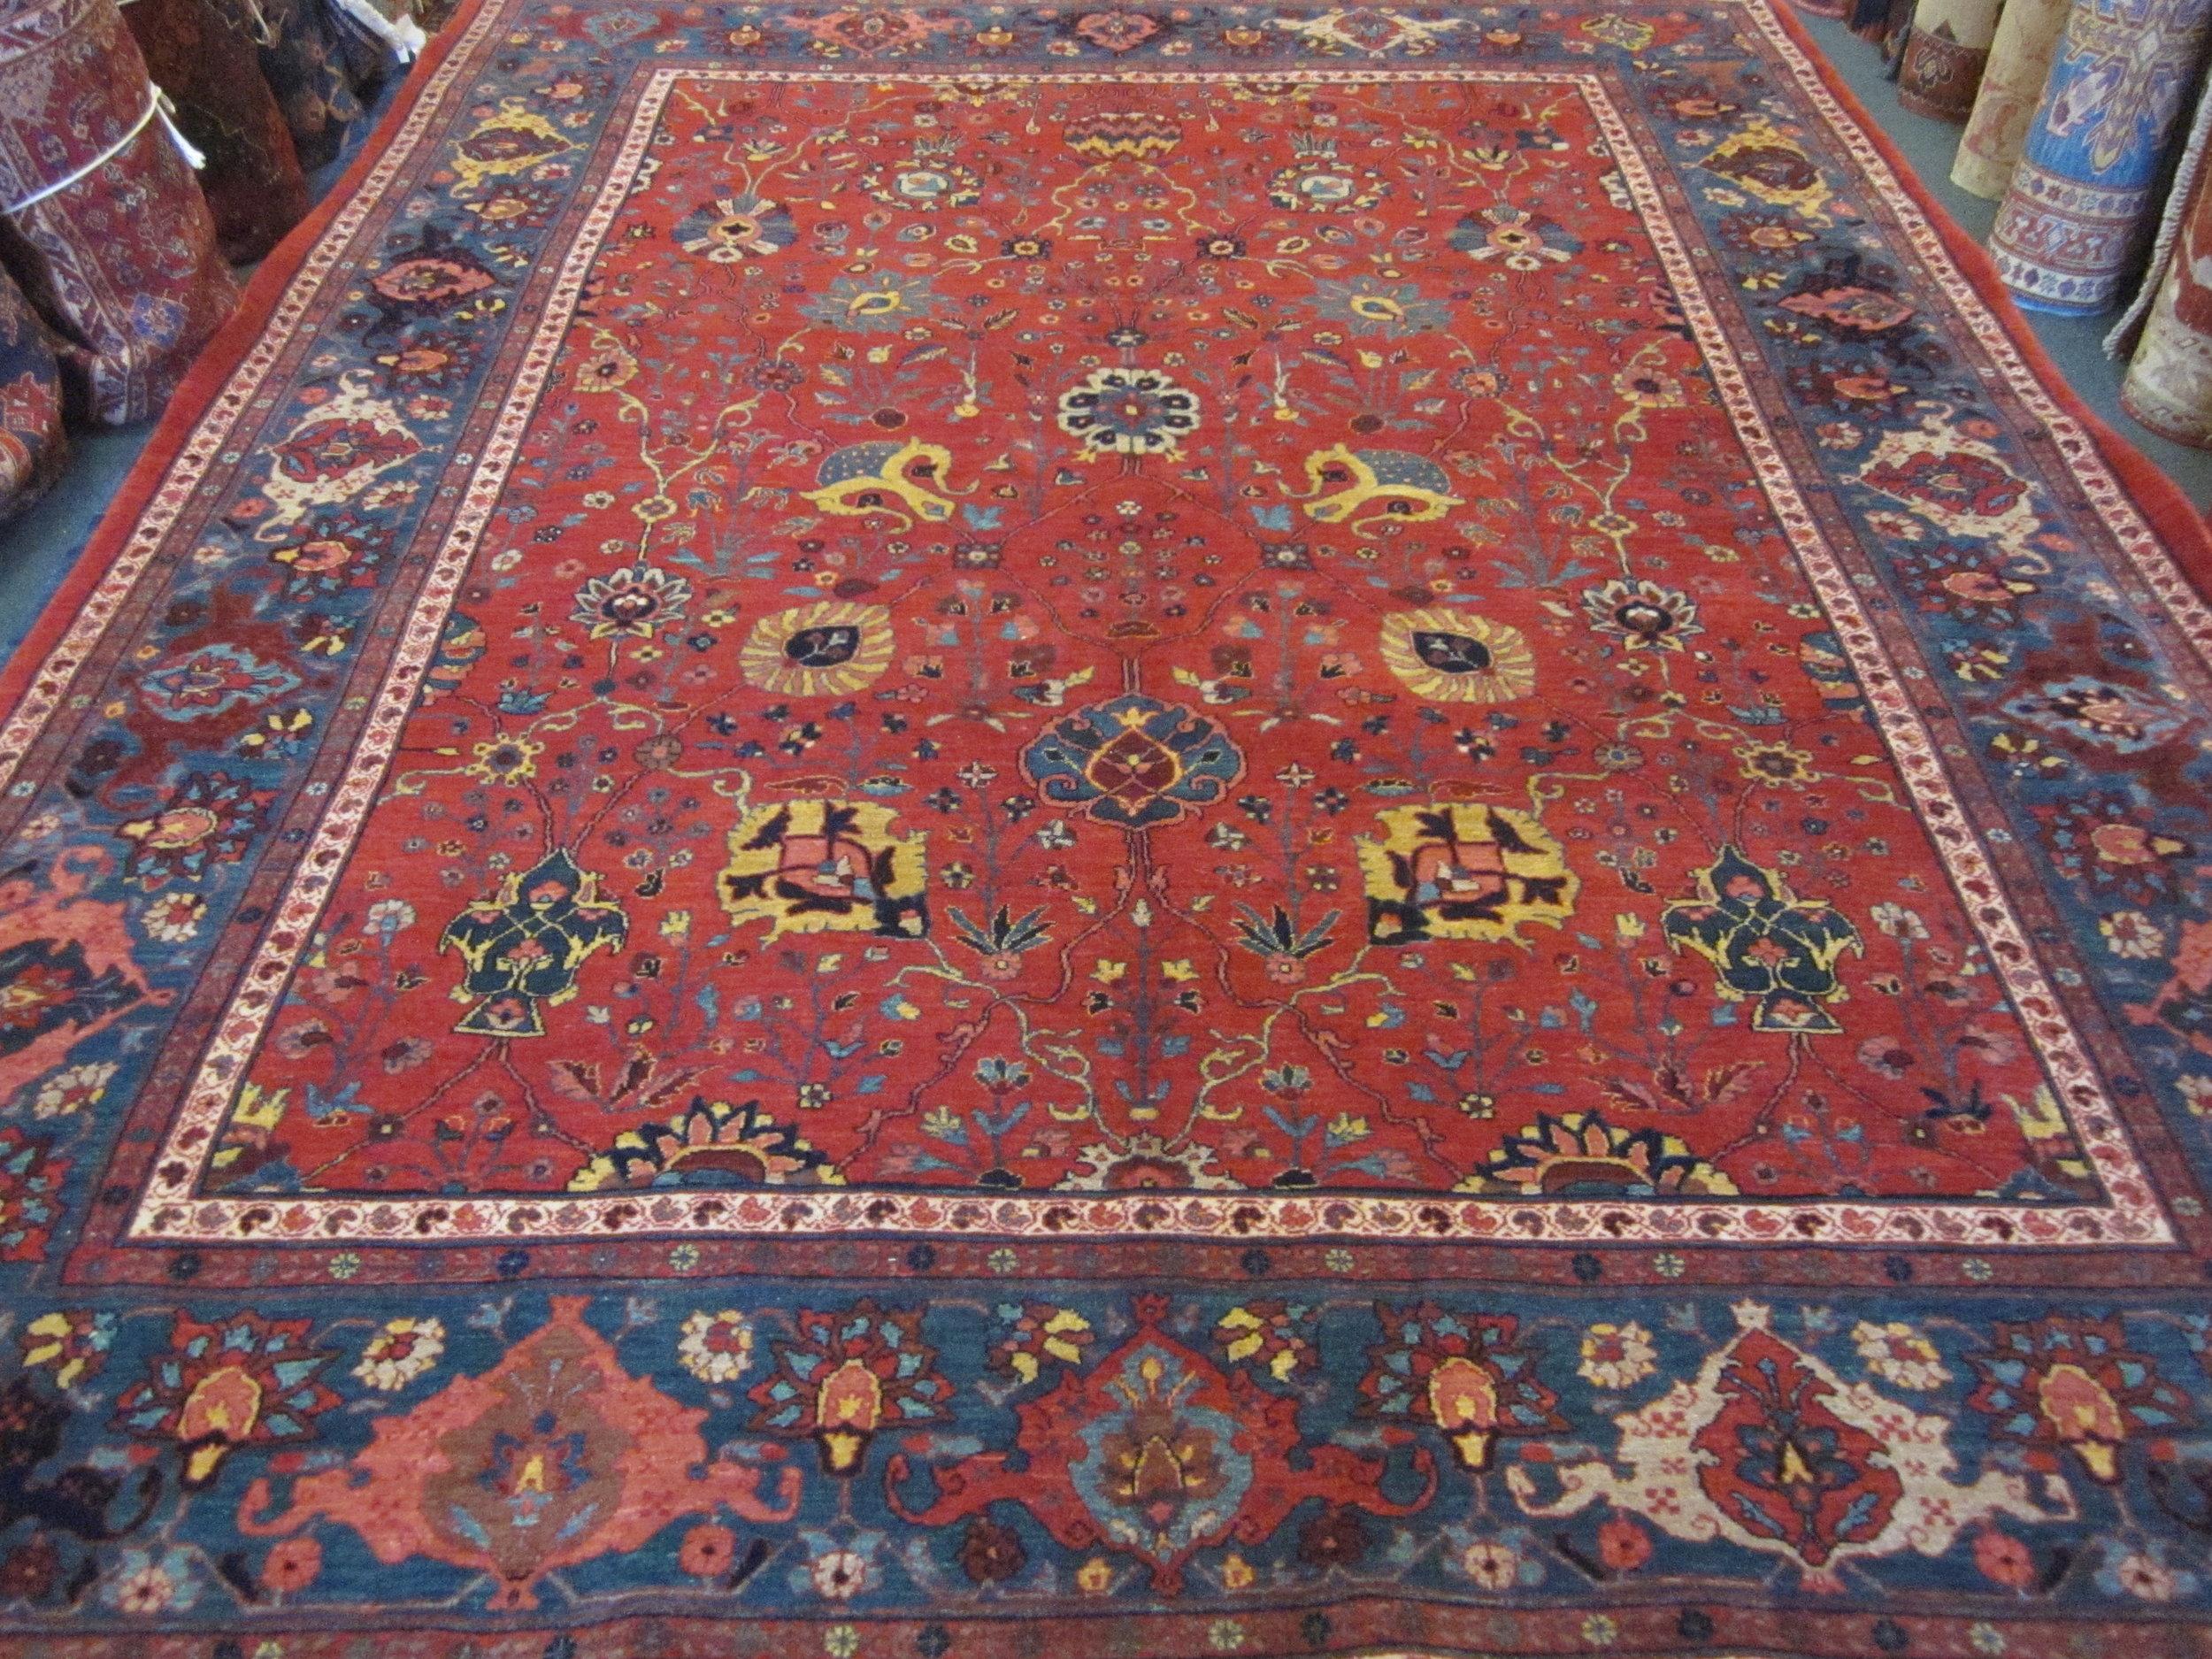 #42a) Gorgeous 8 x 11 Persian Bijar Carpet. Antique Shah Abbas design. New rug!